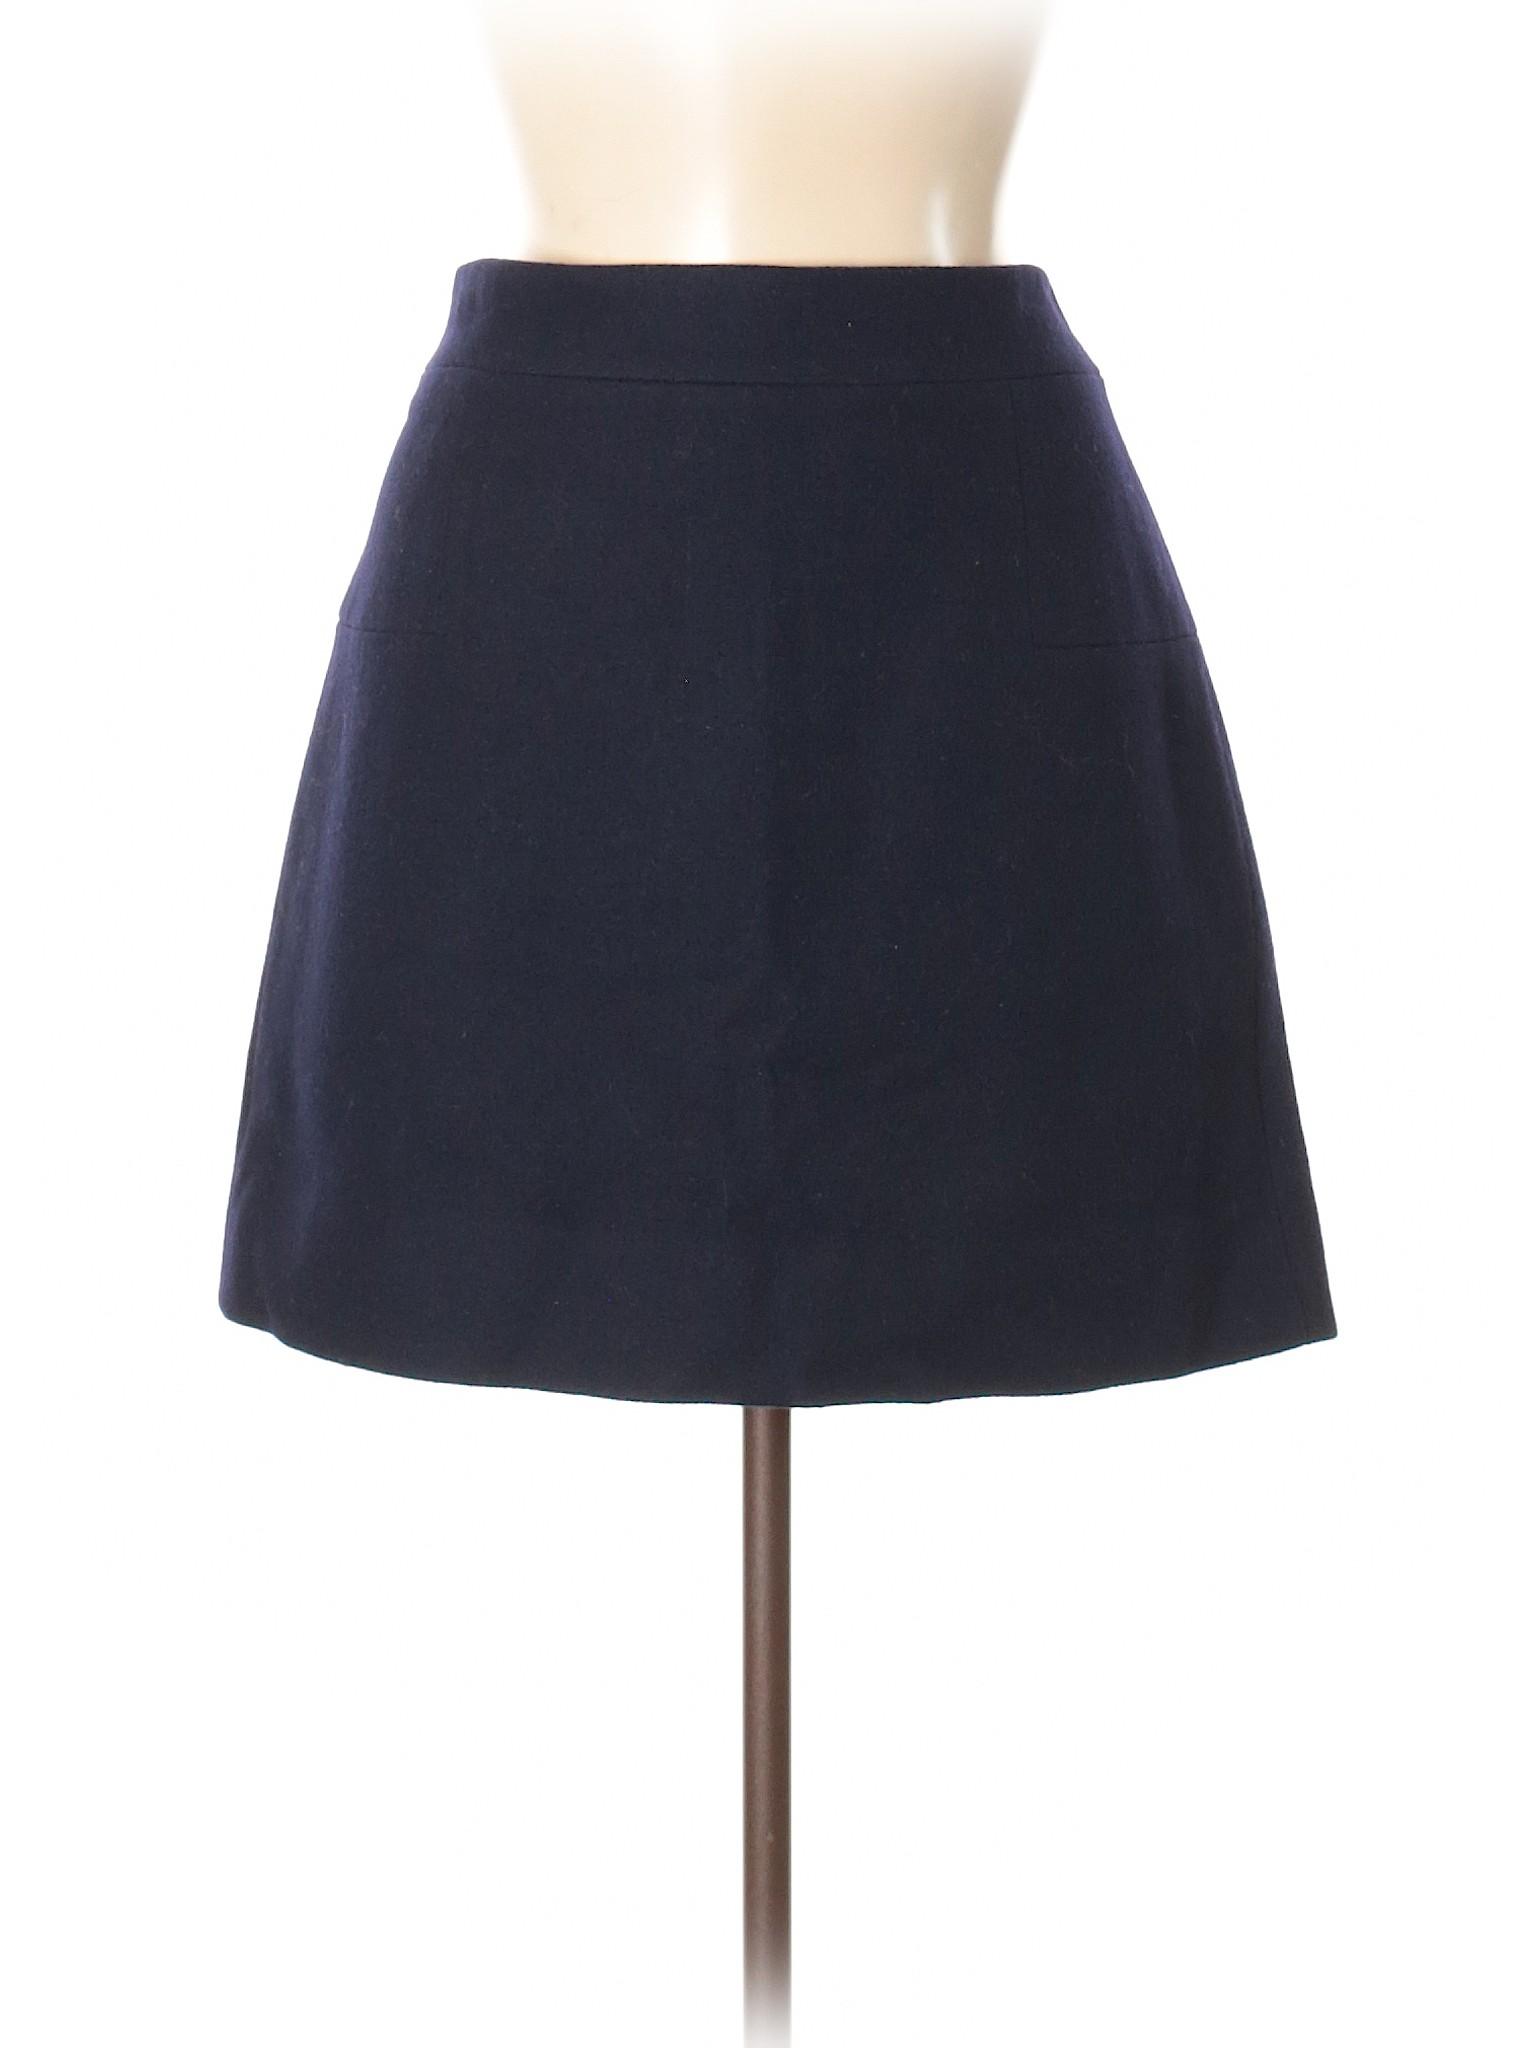 Boutique Skirt Boutique Wool Wool Wool Boutique Boutique Skirt Wool Skirt xAvx1wpq0C